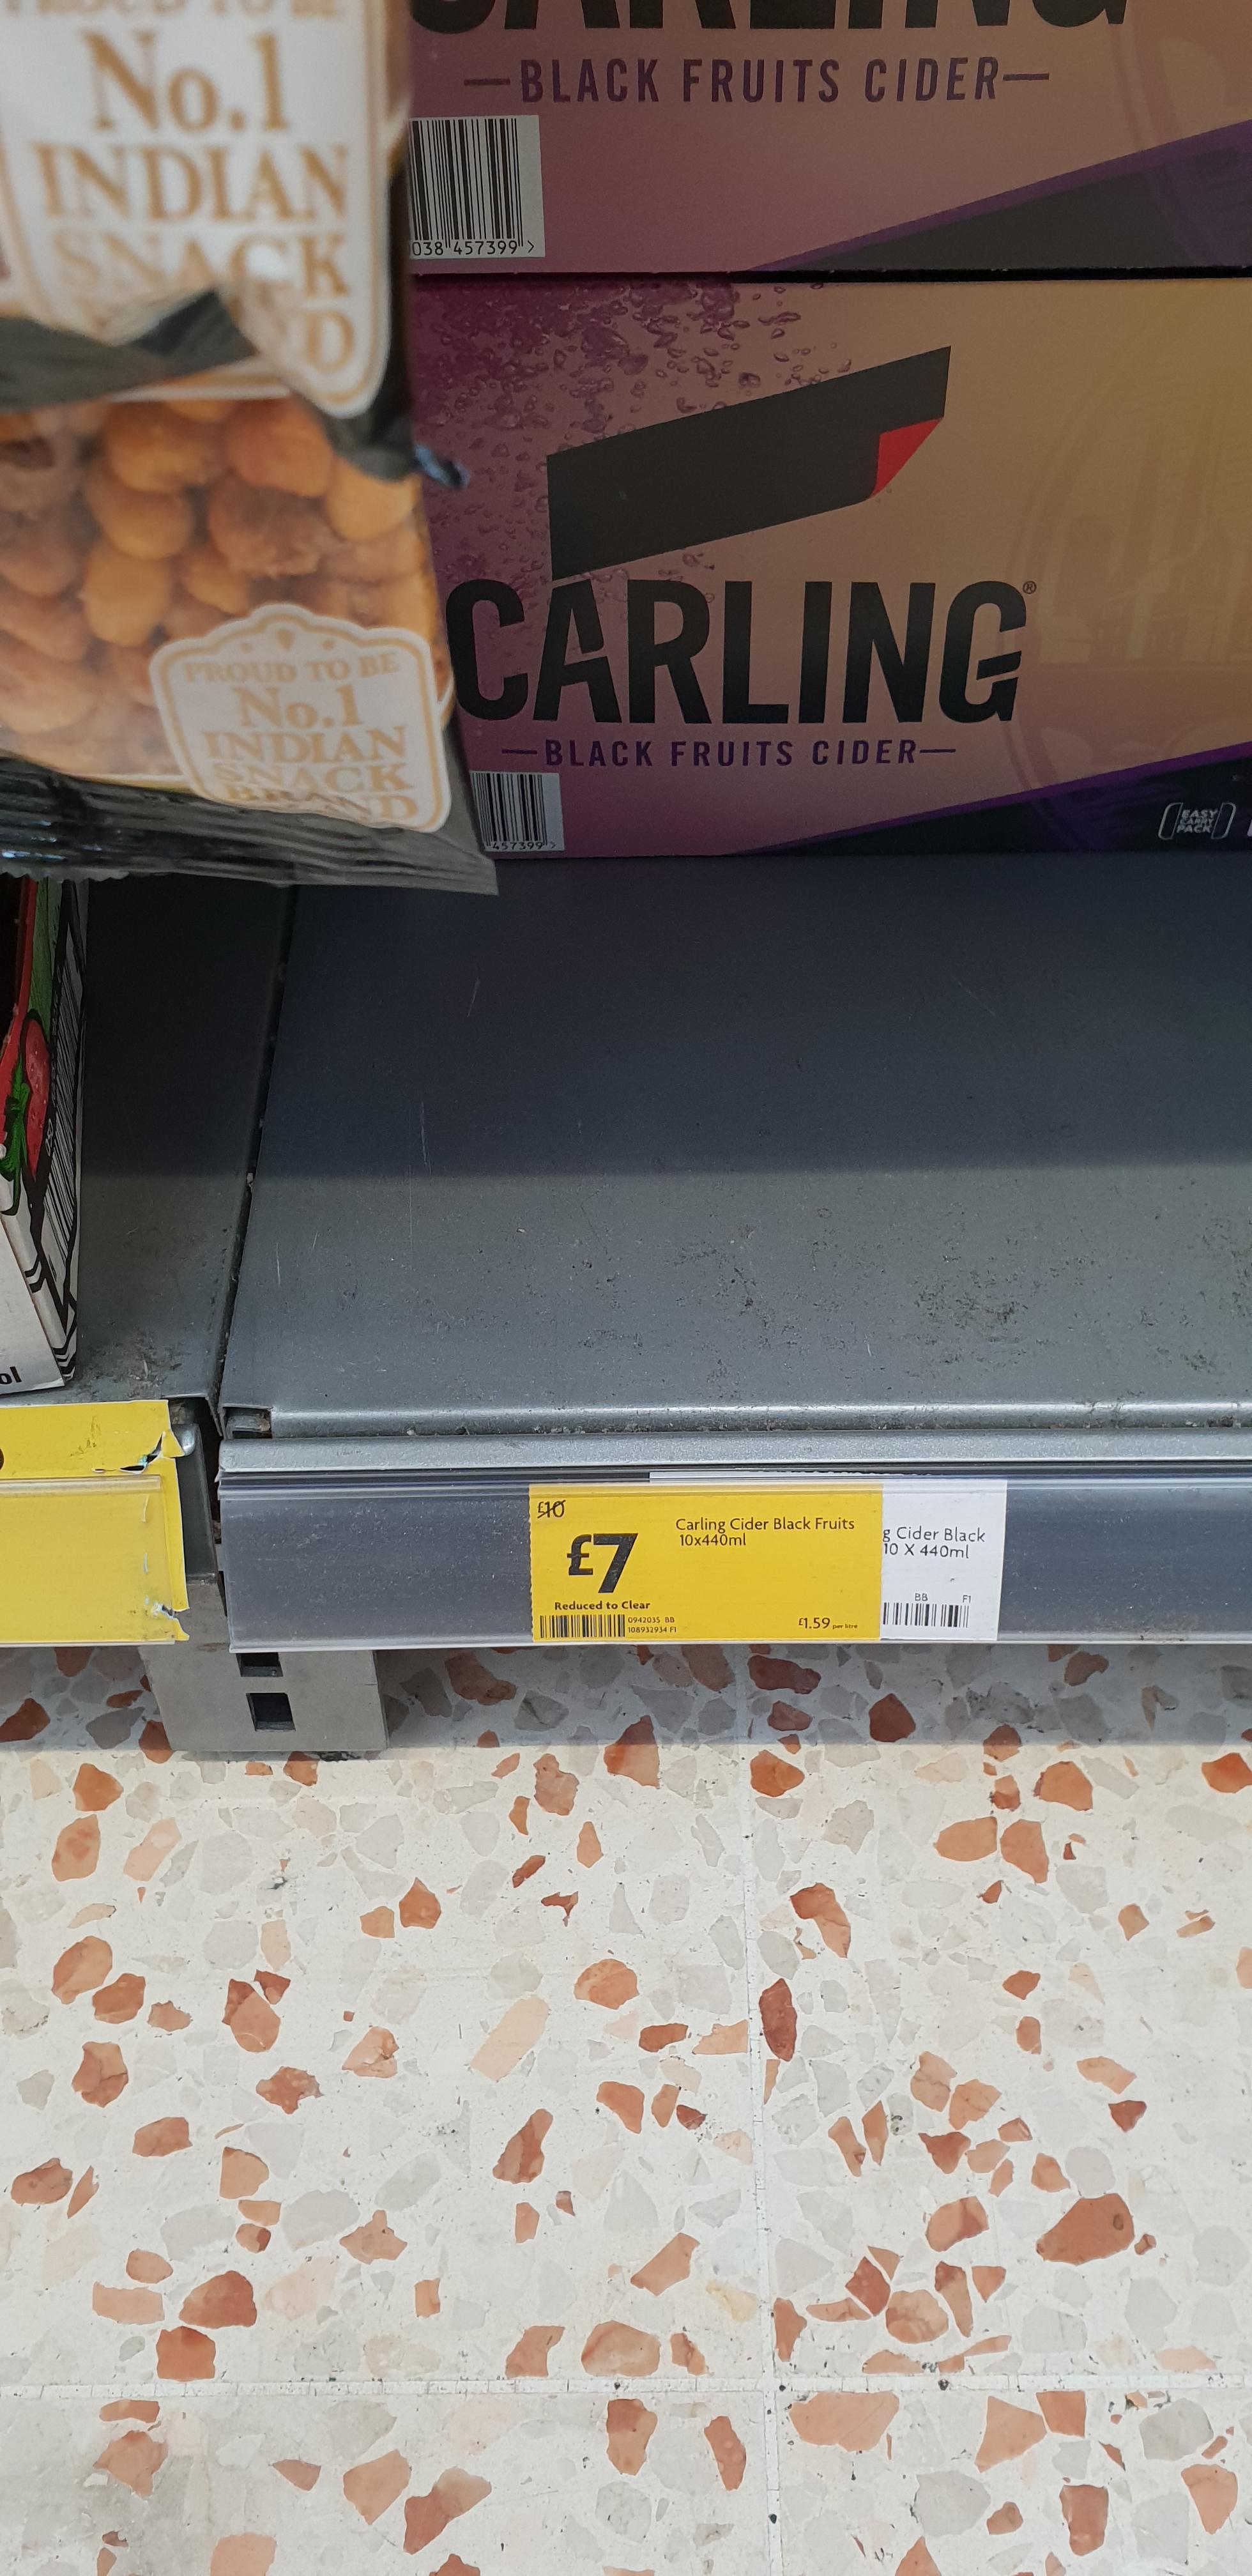 Carling Dark Fruits Cider £7.00 for 10 cans at Morrisons